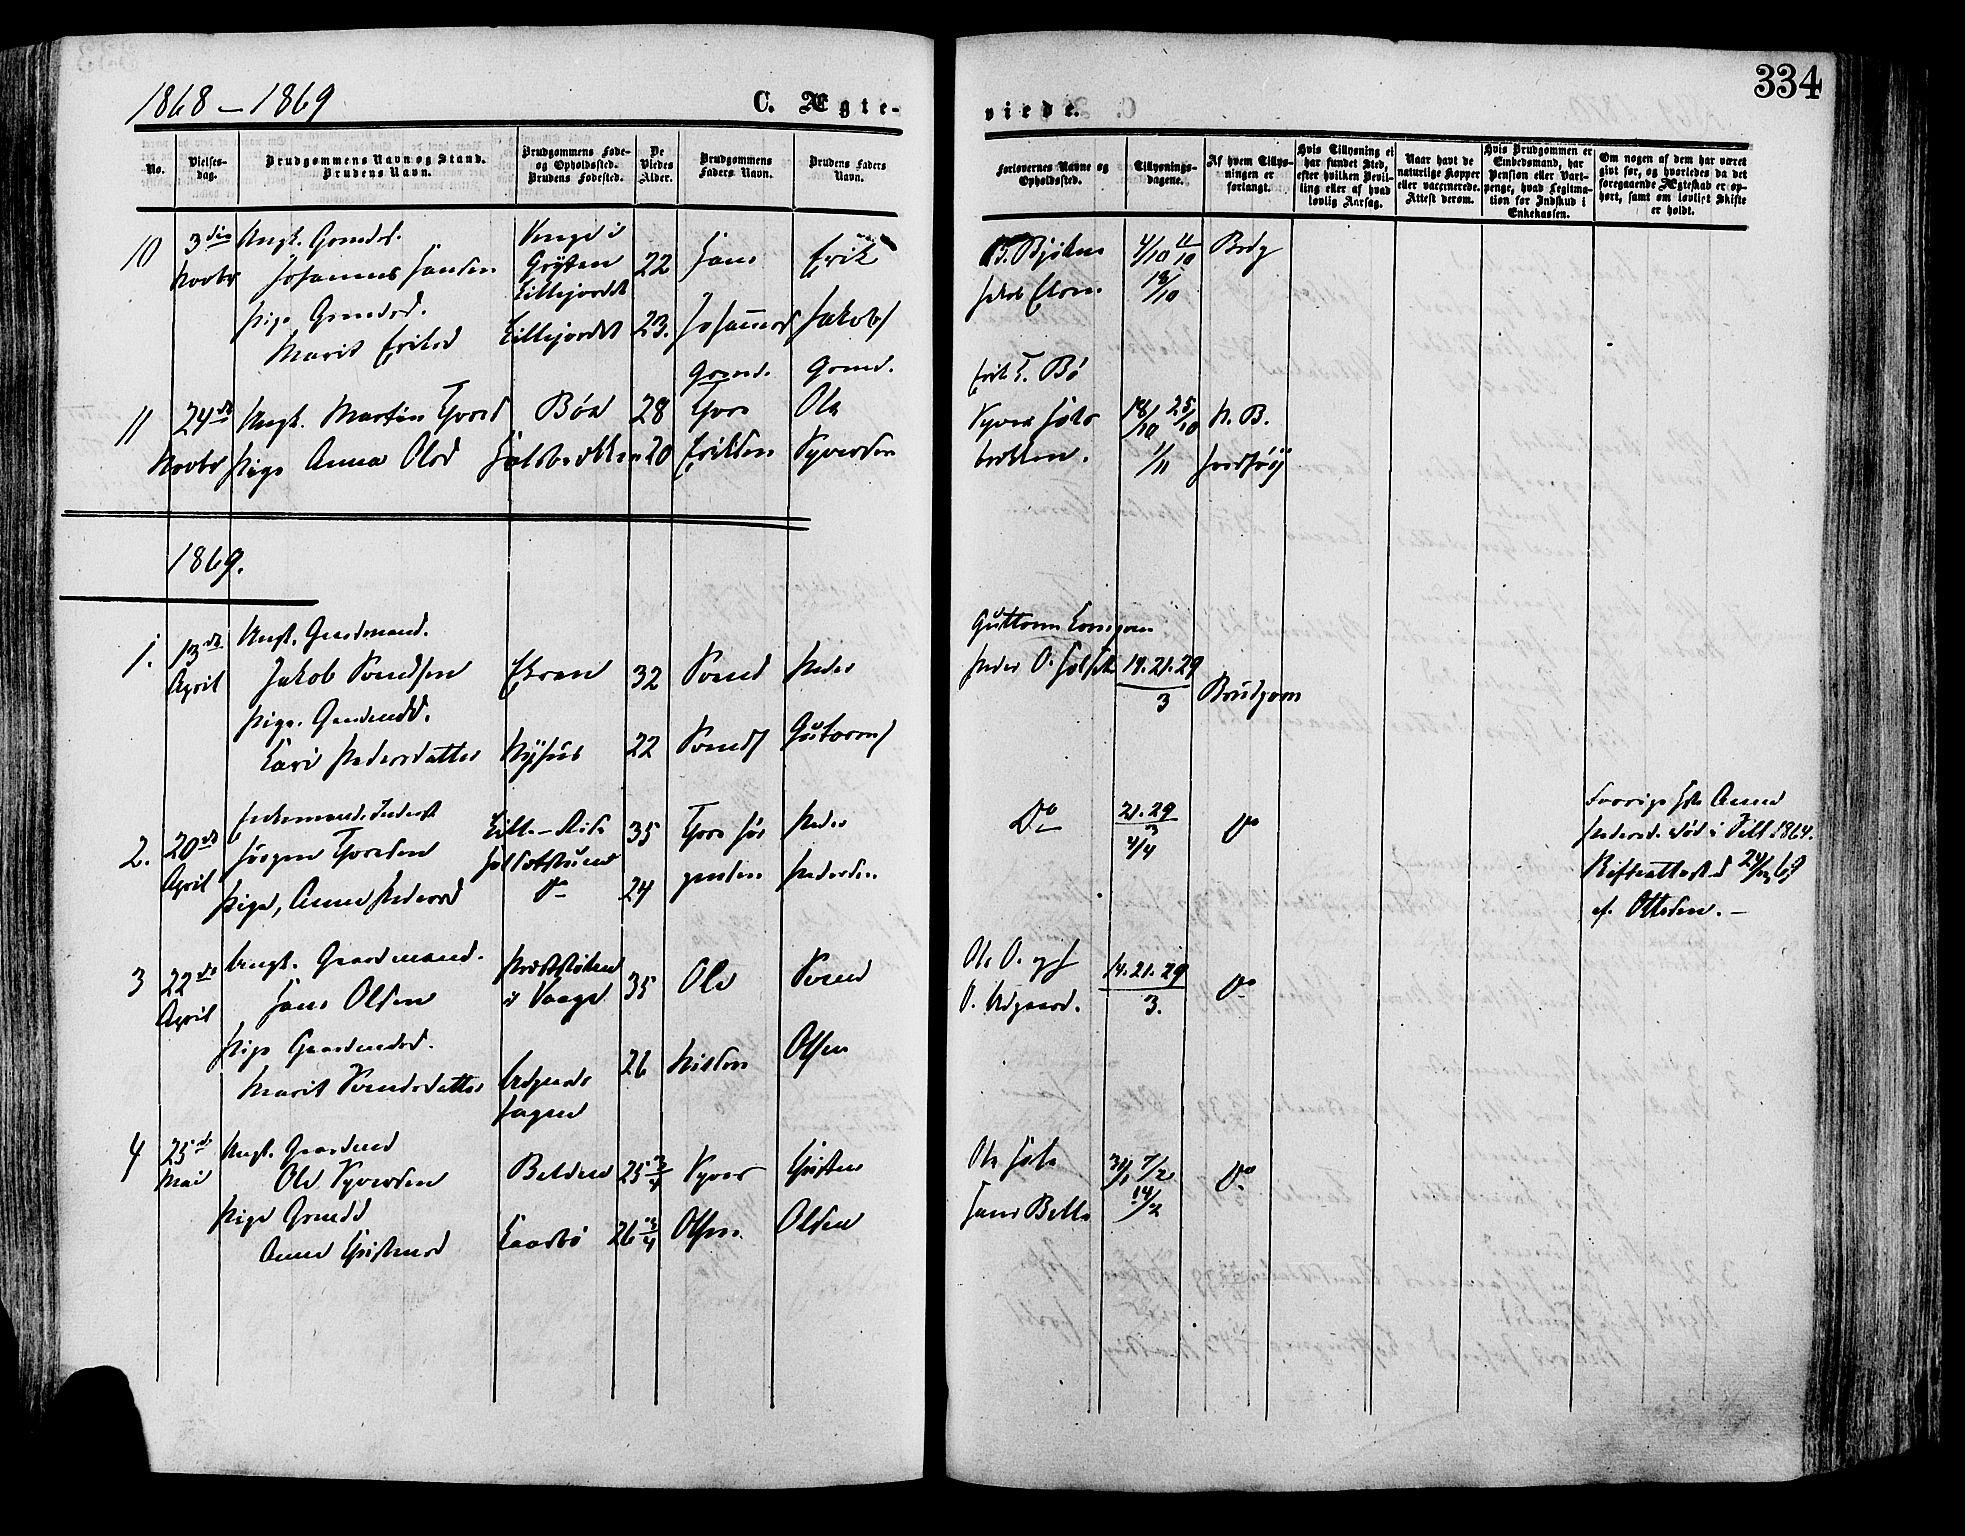 SAH, Lesja prestekontor, Ministerialbok nr. 8, 1854-1880, s. 334